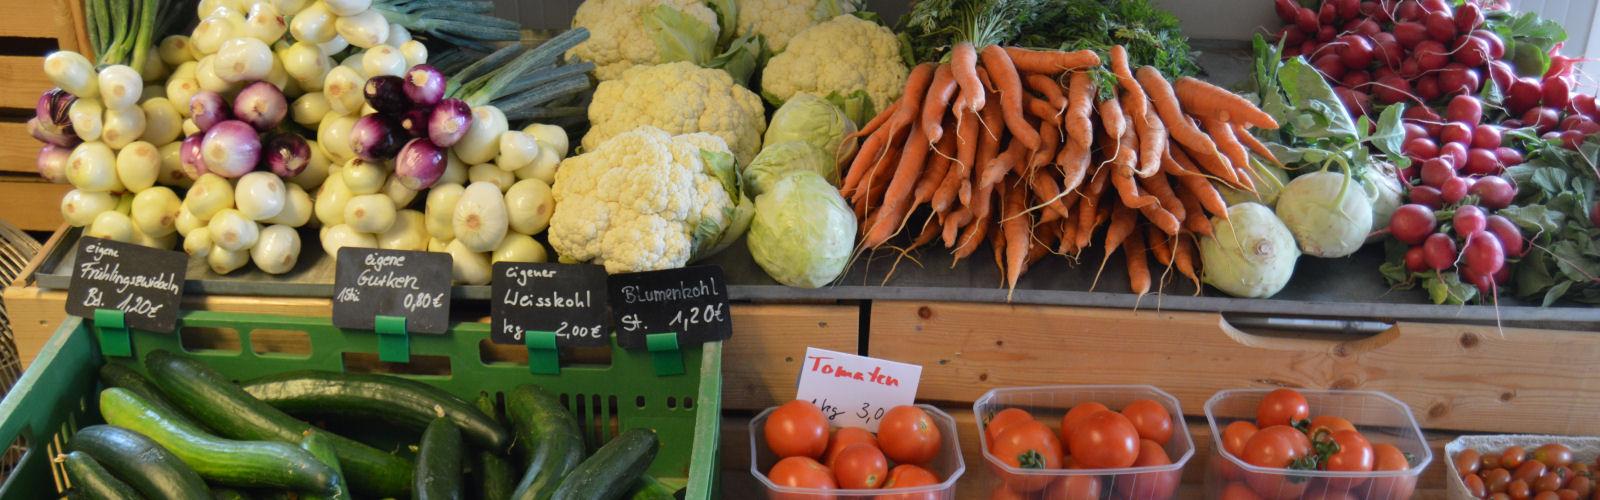 Gemüsekisten aus dem Landkreis Lörrach